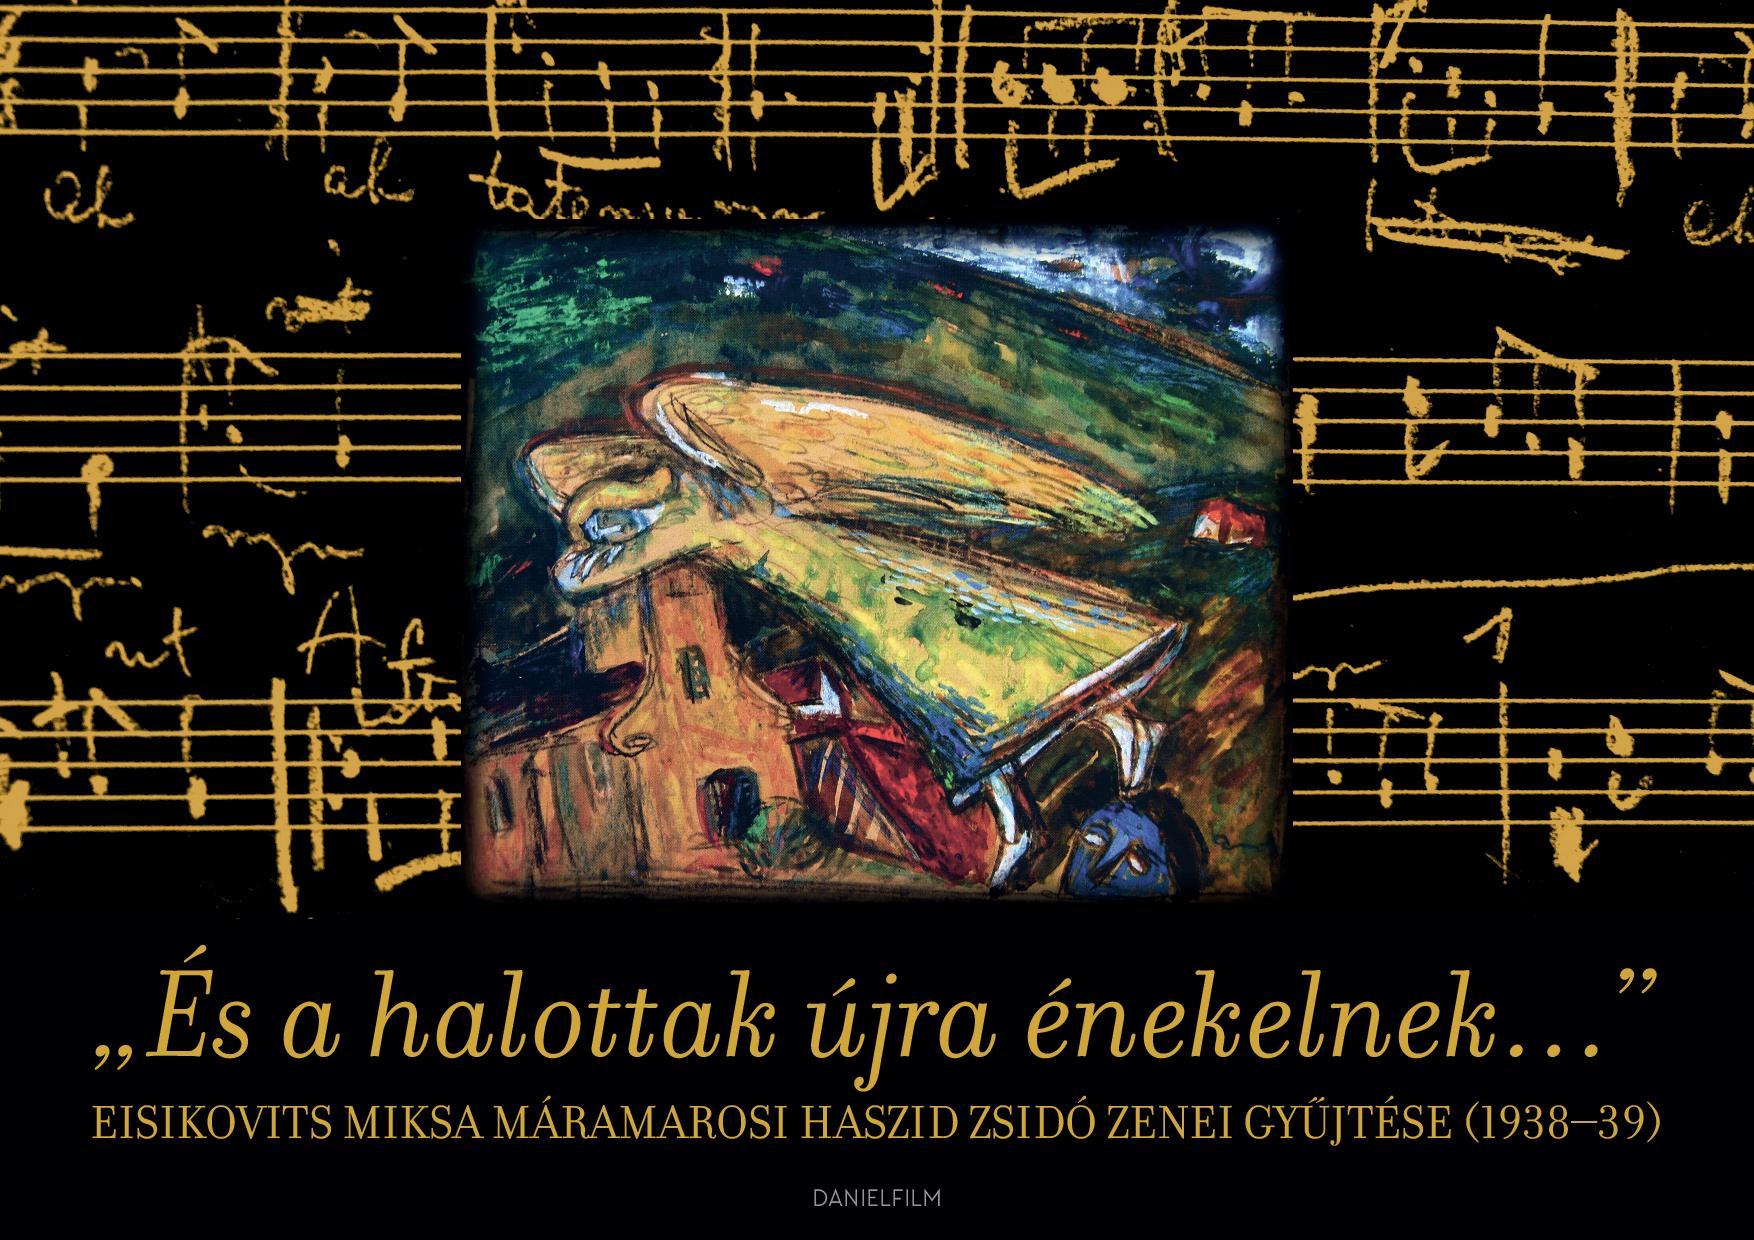 eisikovits_miksa_aranyos_borito_fekete_paszpartuval-page-001.jpg